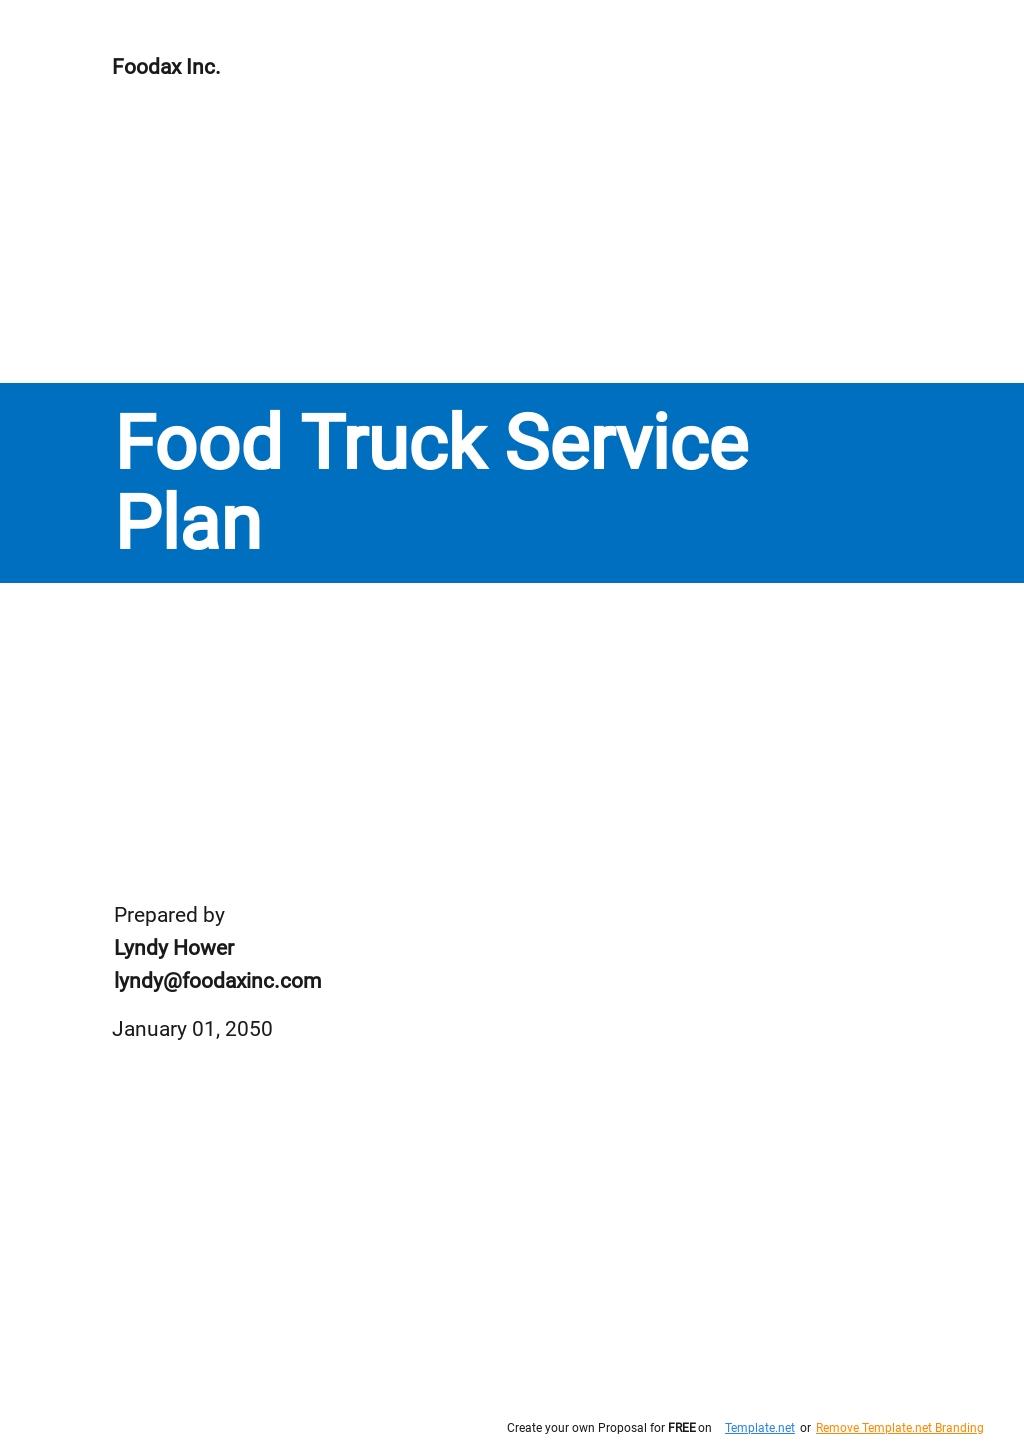 Free Food Truck Service Plan Template.jpe